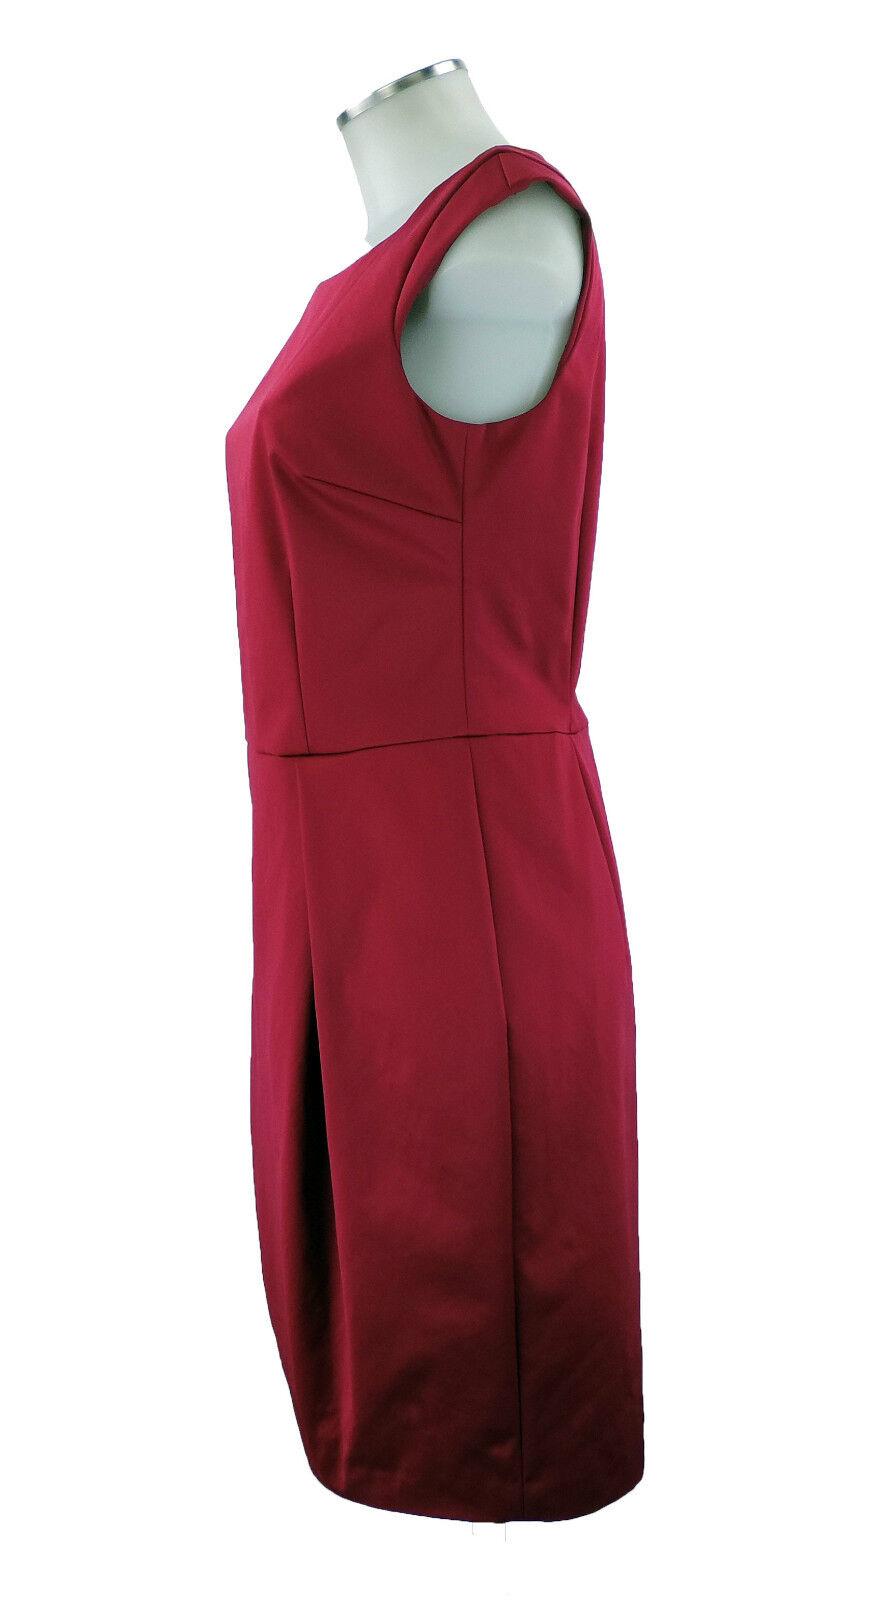 Apriori Kleid 38 fuchsia Etuikleid Etuikleid Etuikleid Polyester elegant neu dress robe 88ebfe